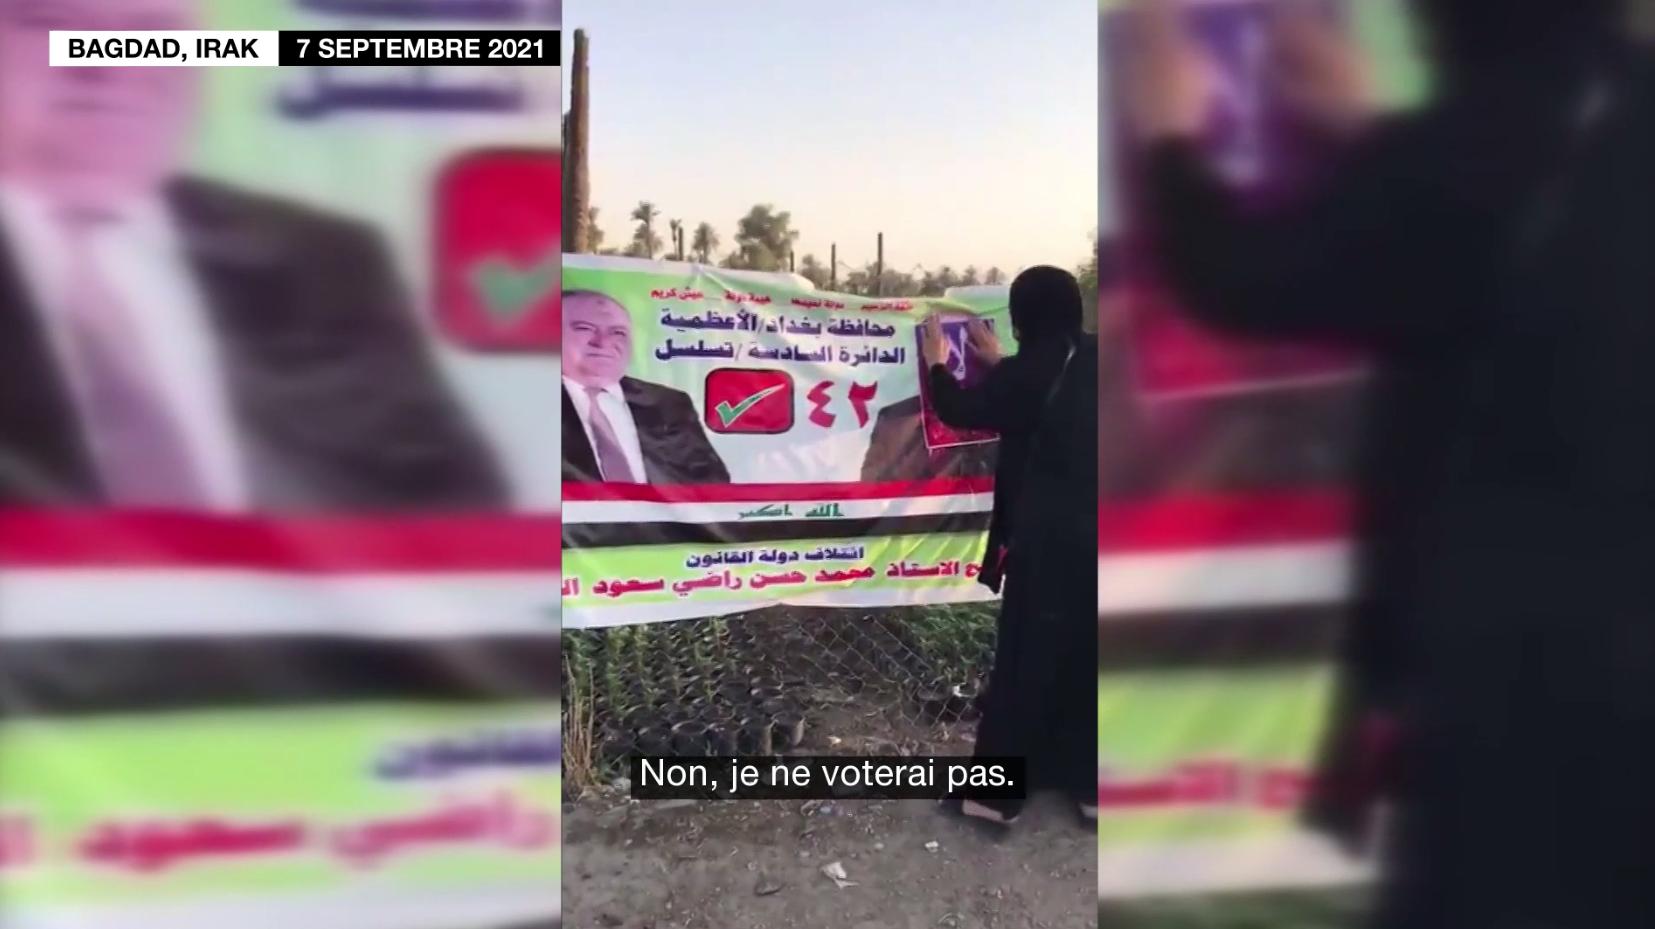 irak boycott elelction